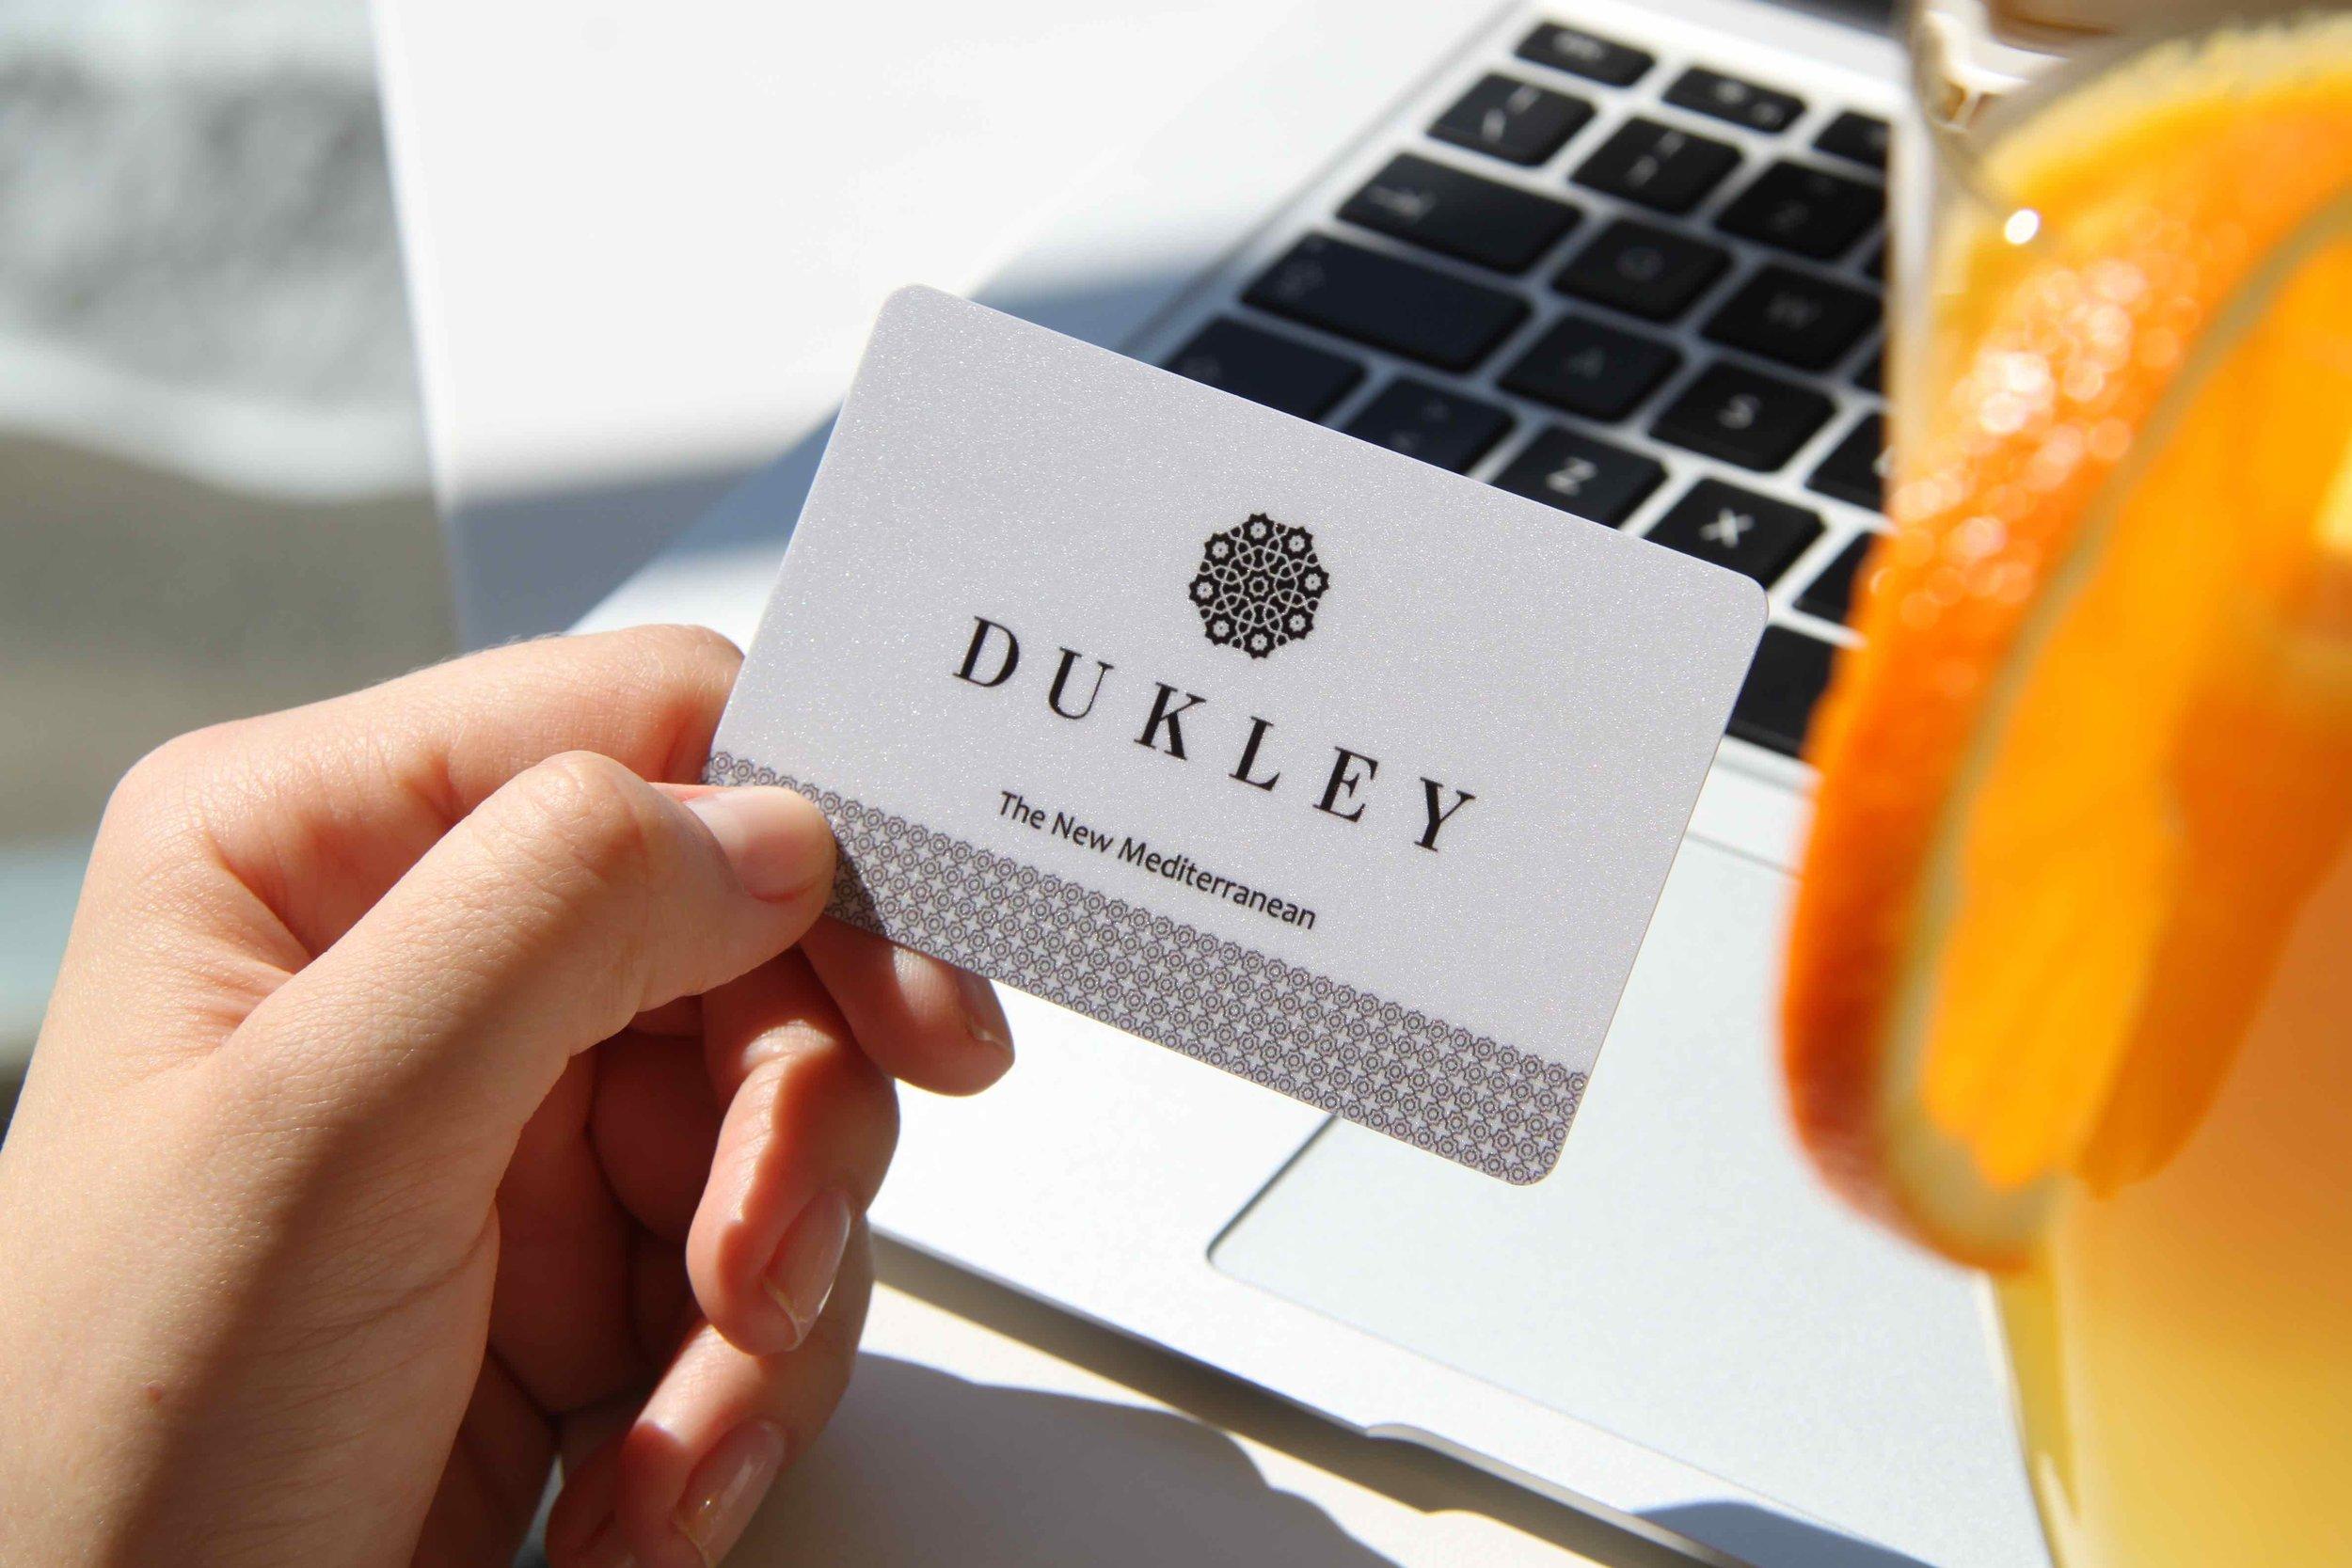 Dukley Card Silver.jpg